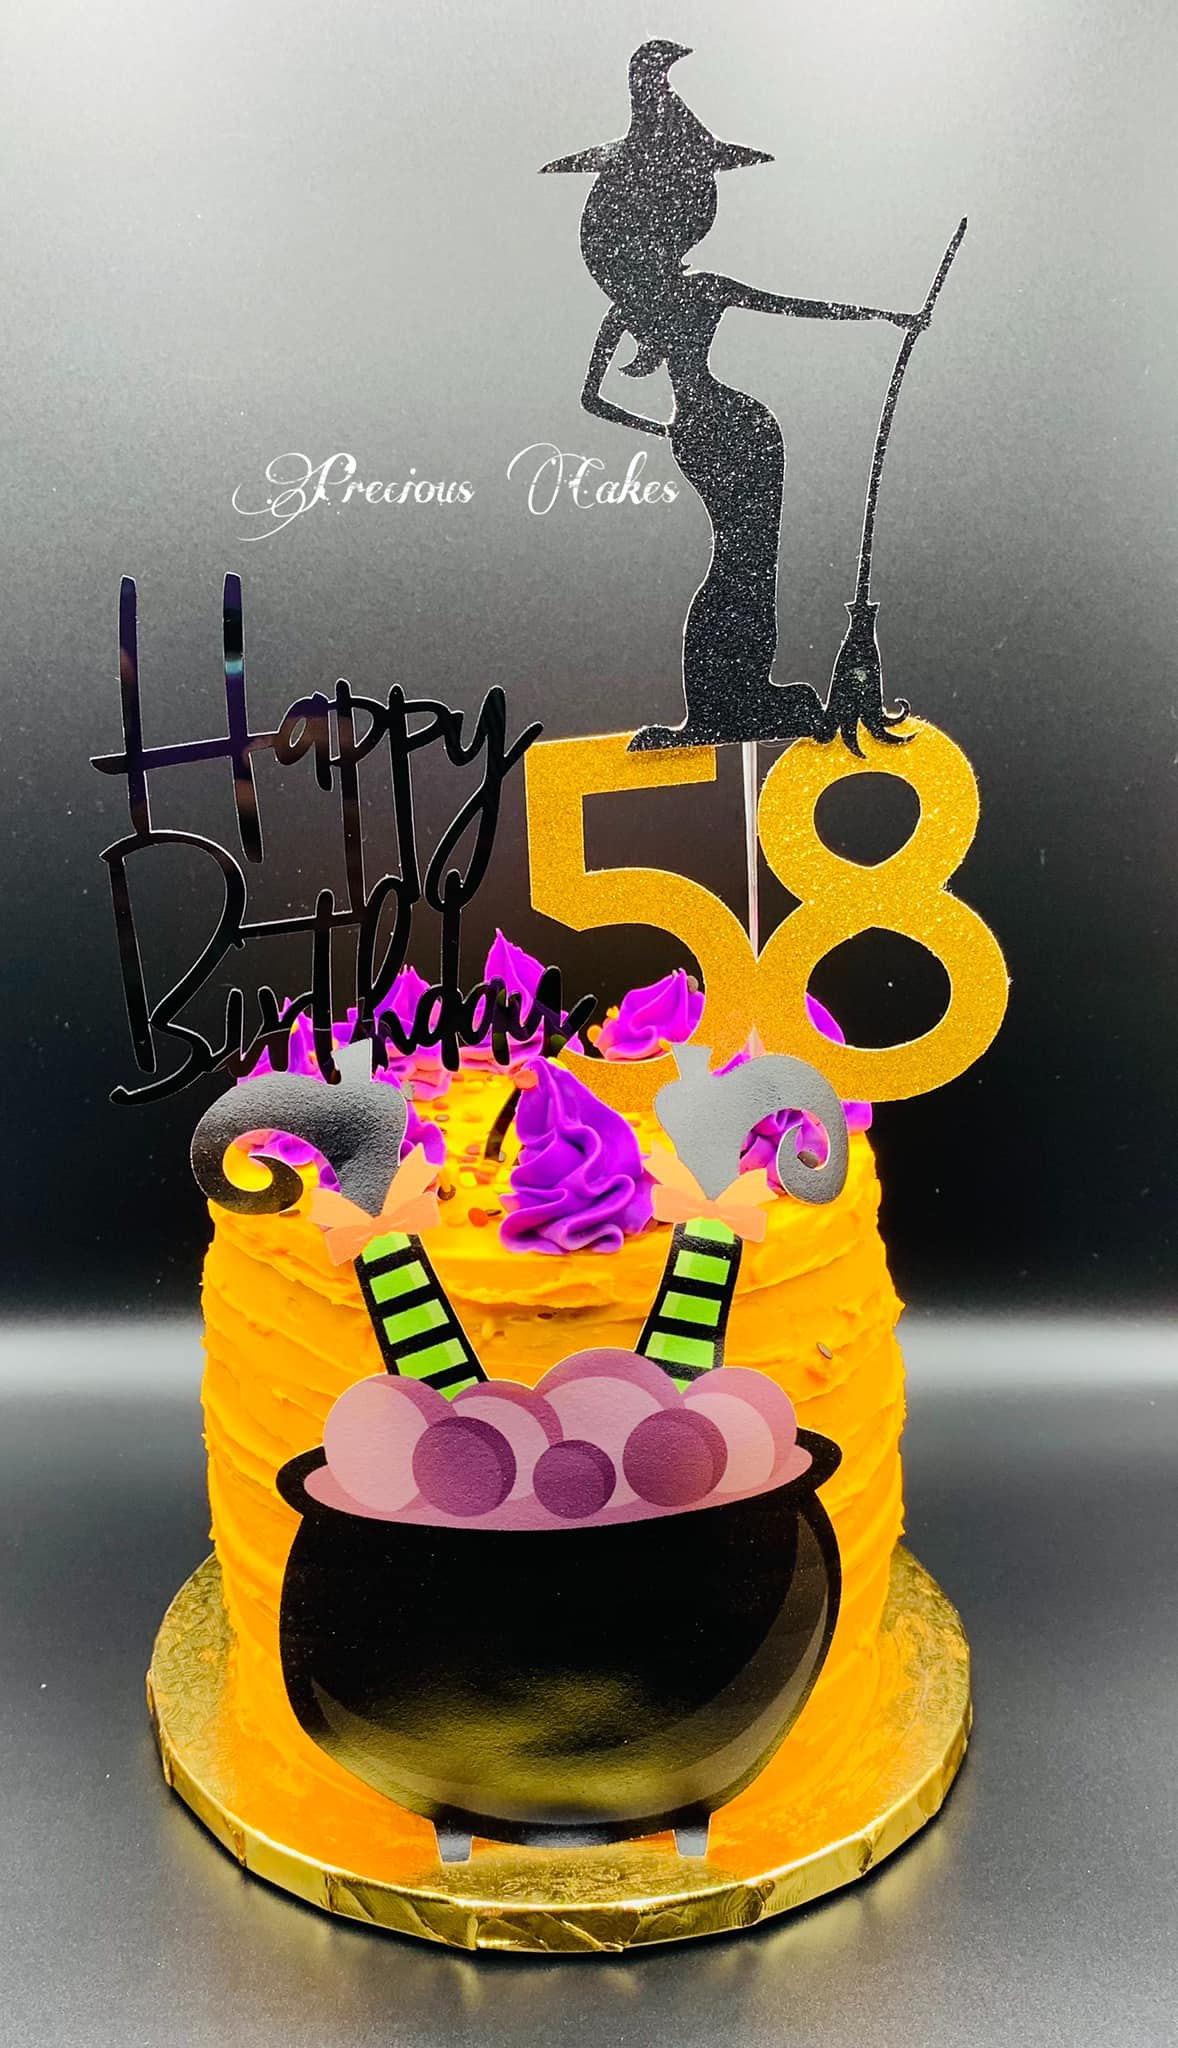 Cake by Precious Cake